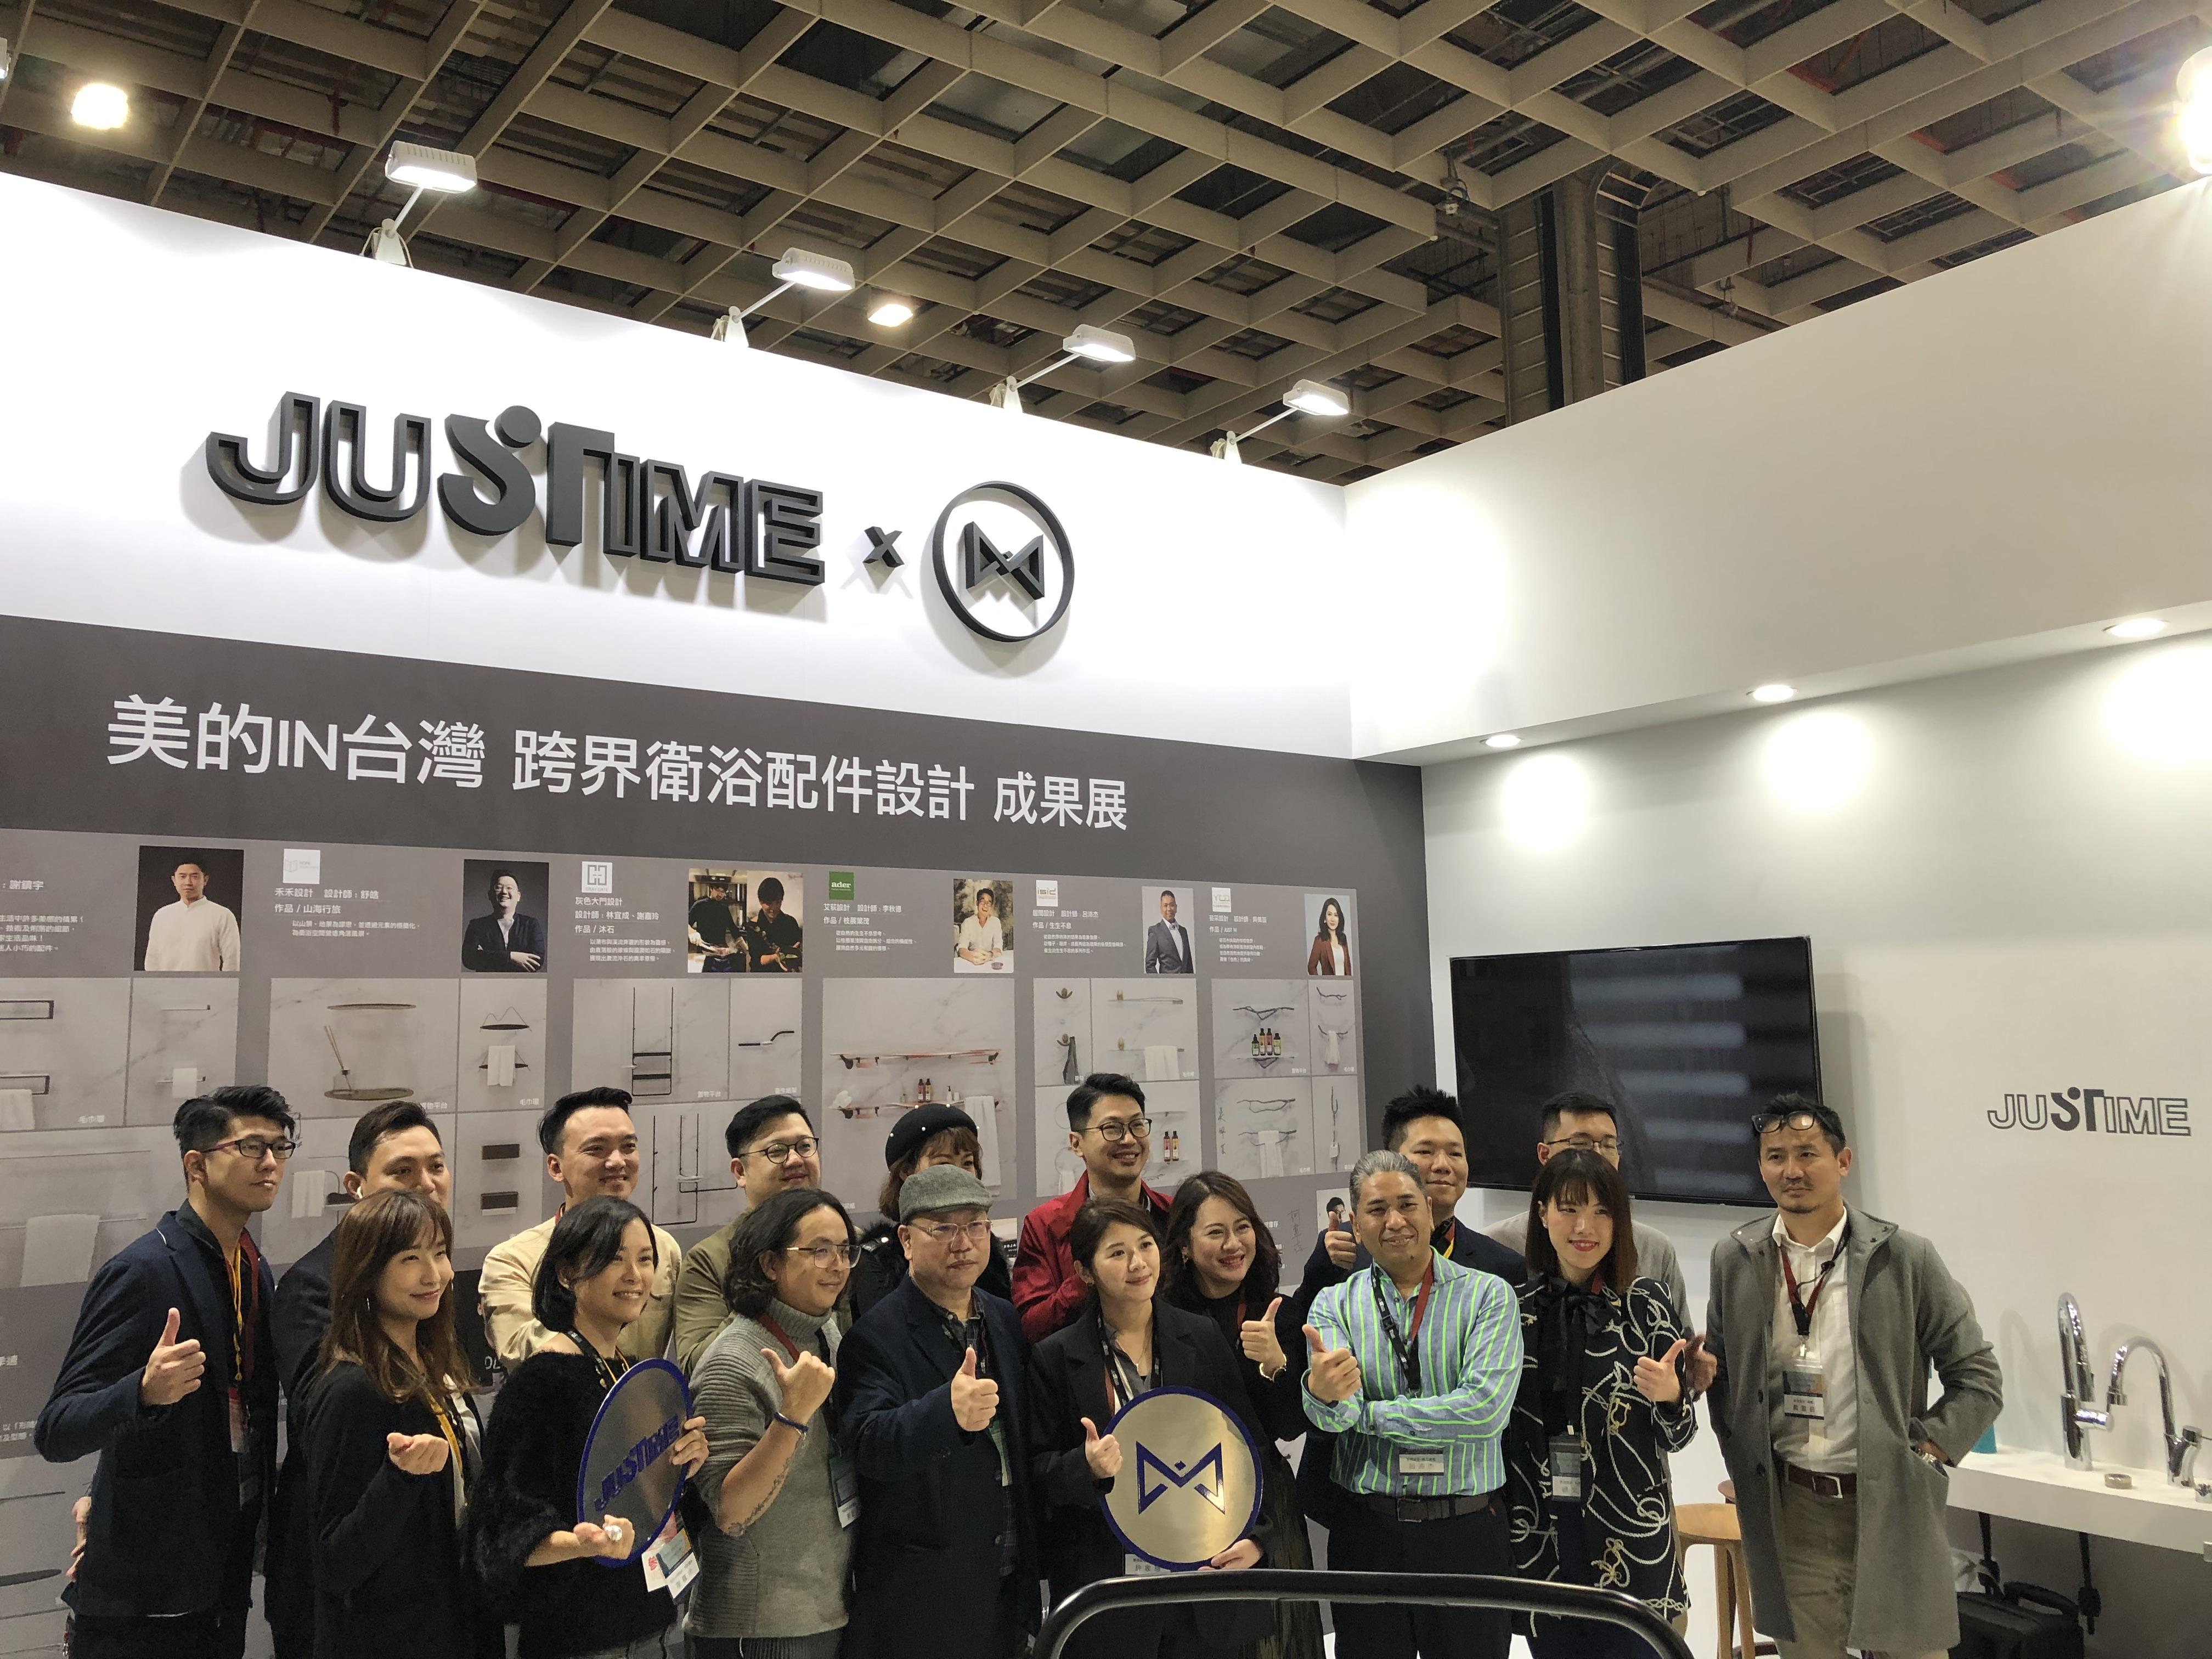 """Made in Taiwan"" Genesis Designs inspires Cross-industrial Aesthetics"